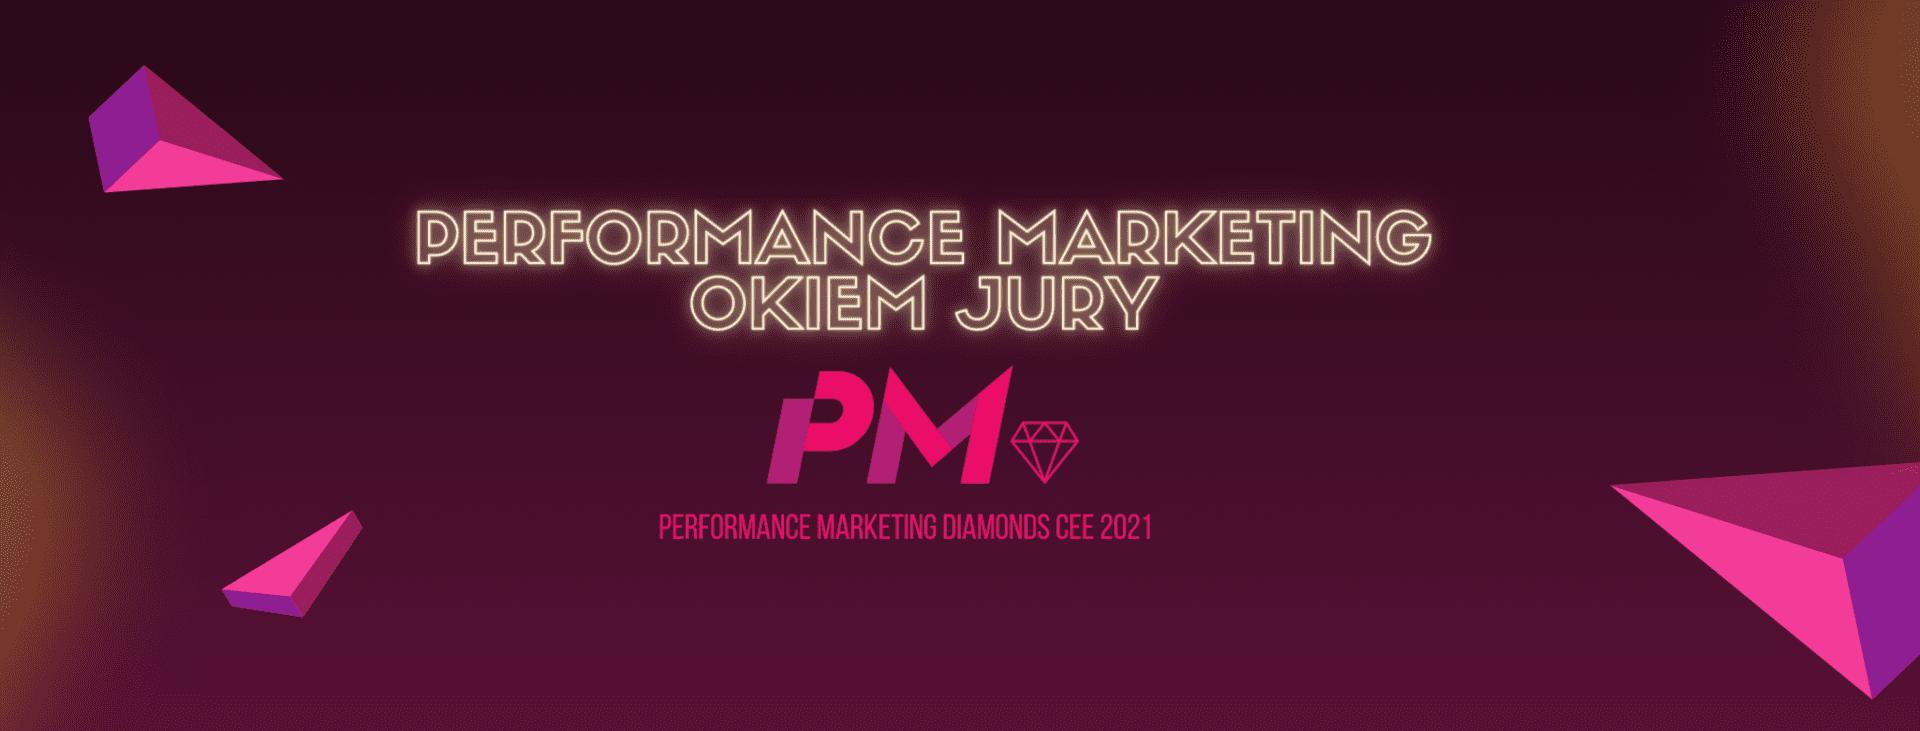 Performance Marketing Diamonds CEE 2021 – nowości, jury